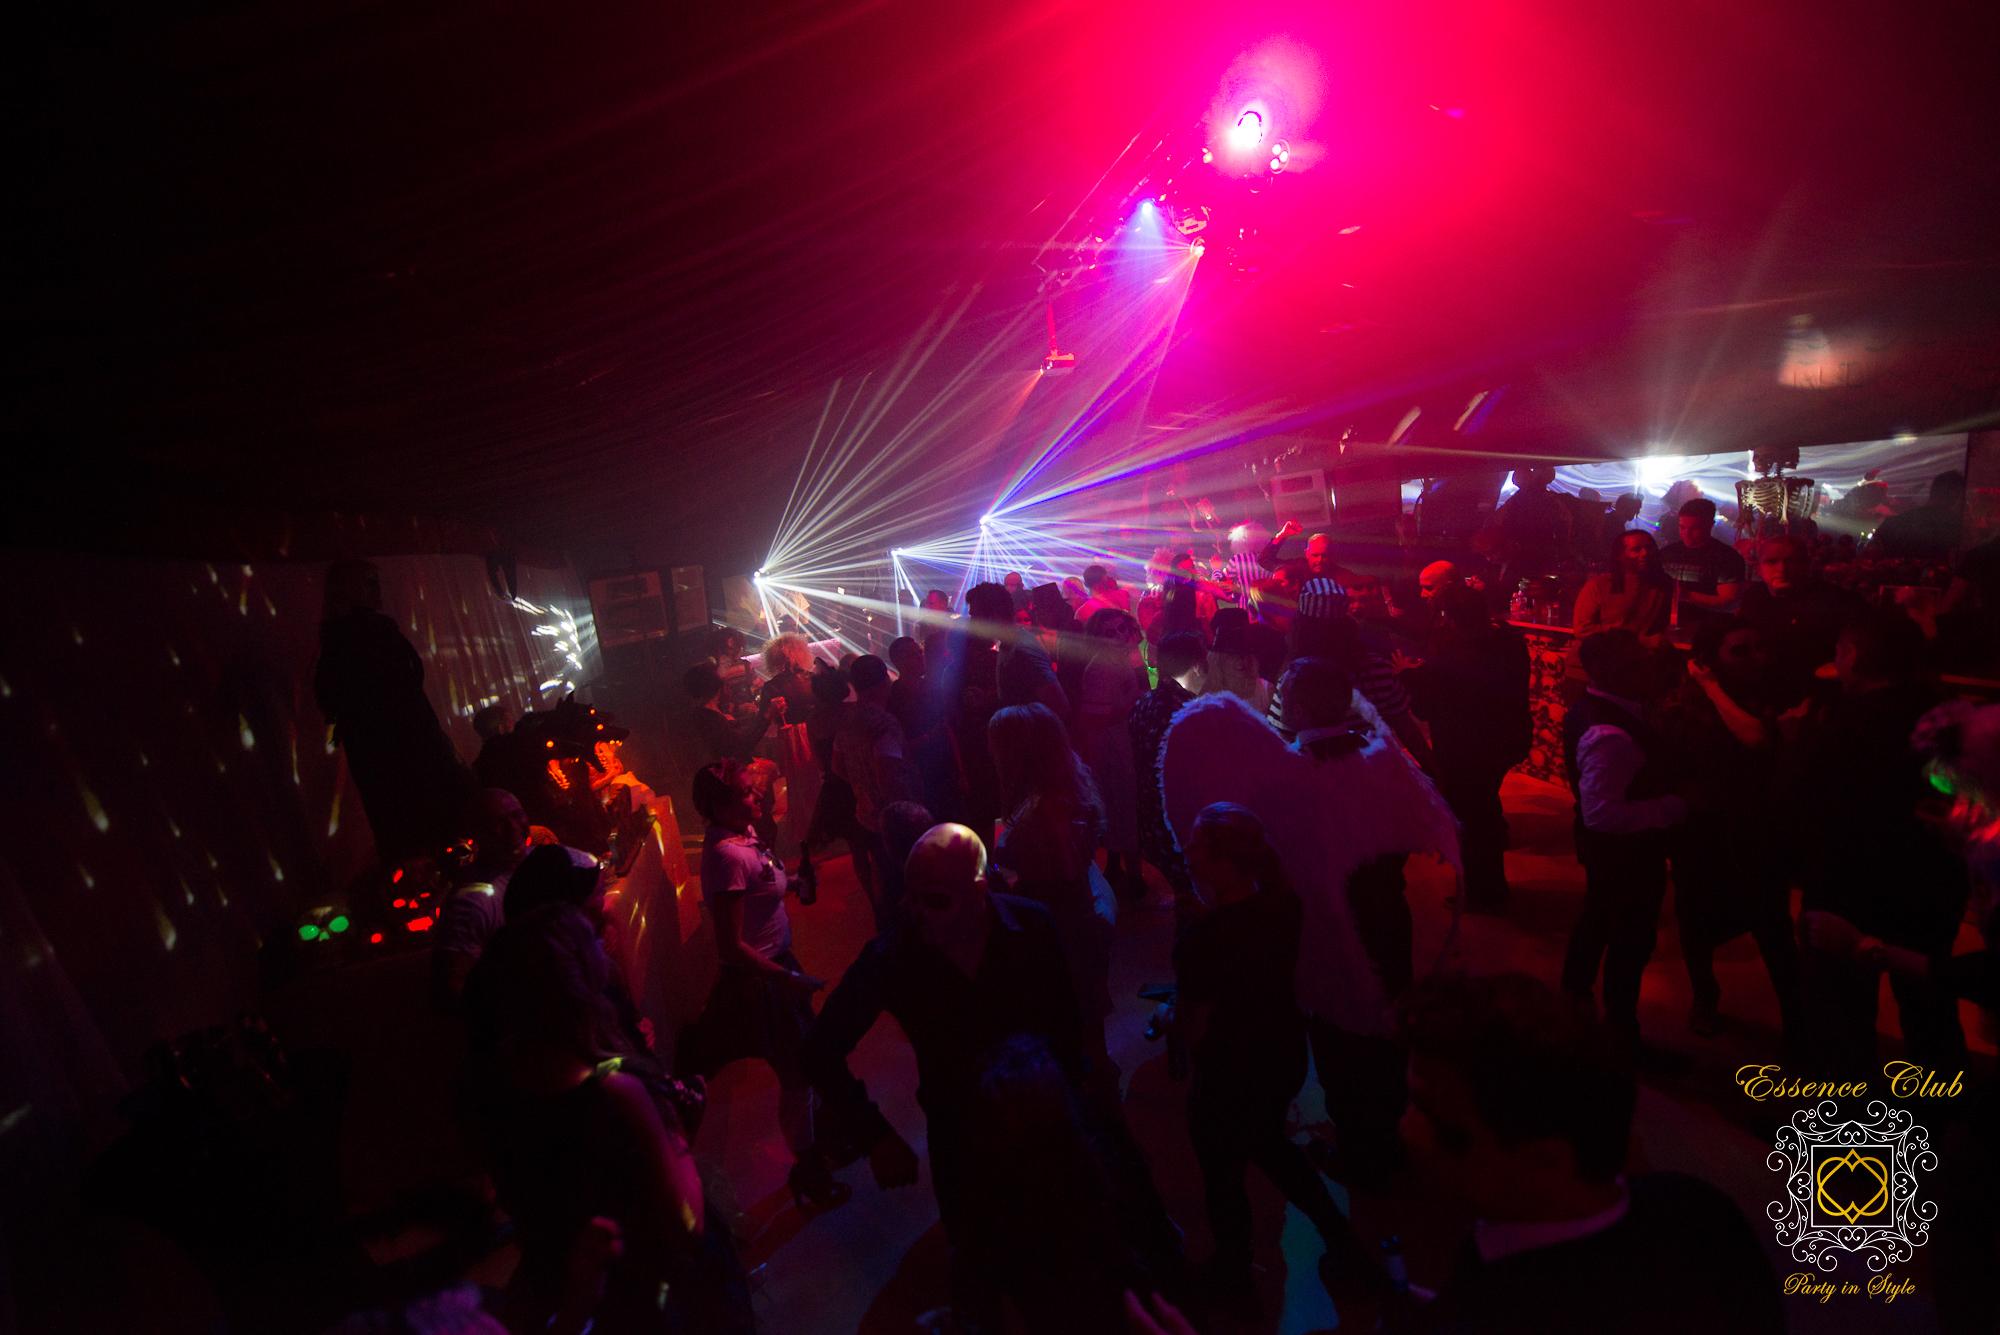 Essence club hell